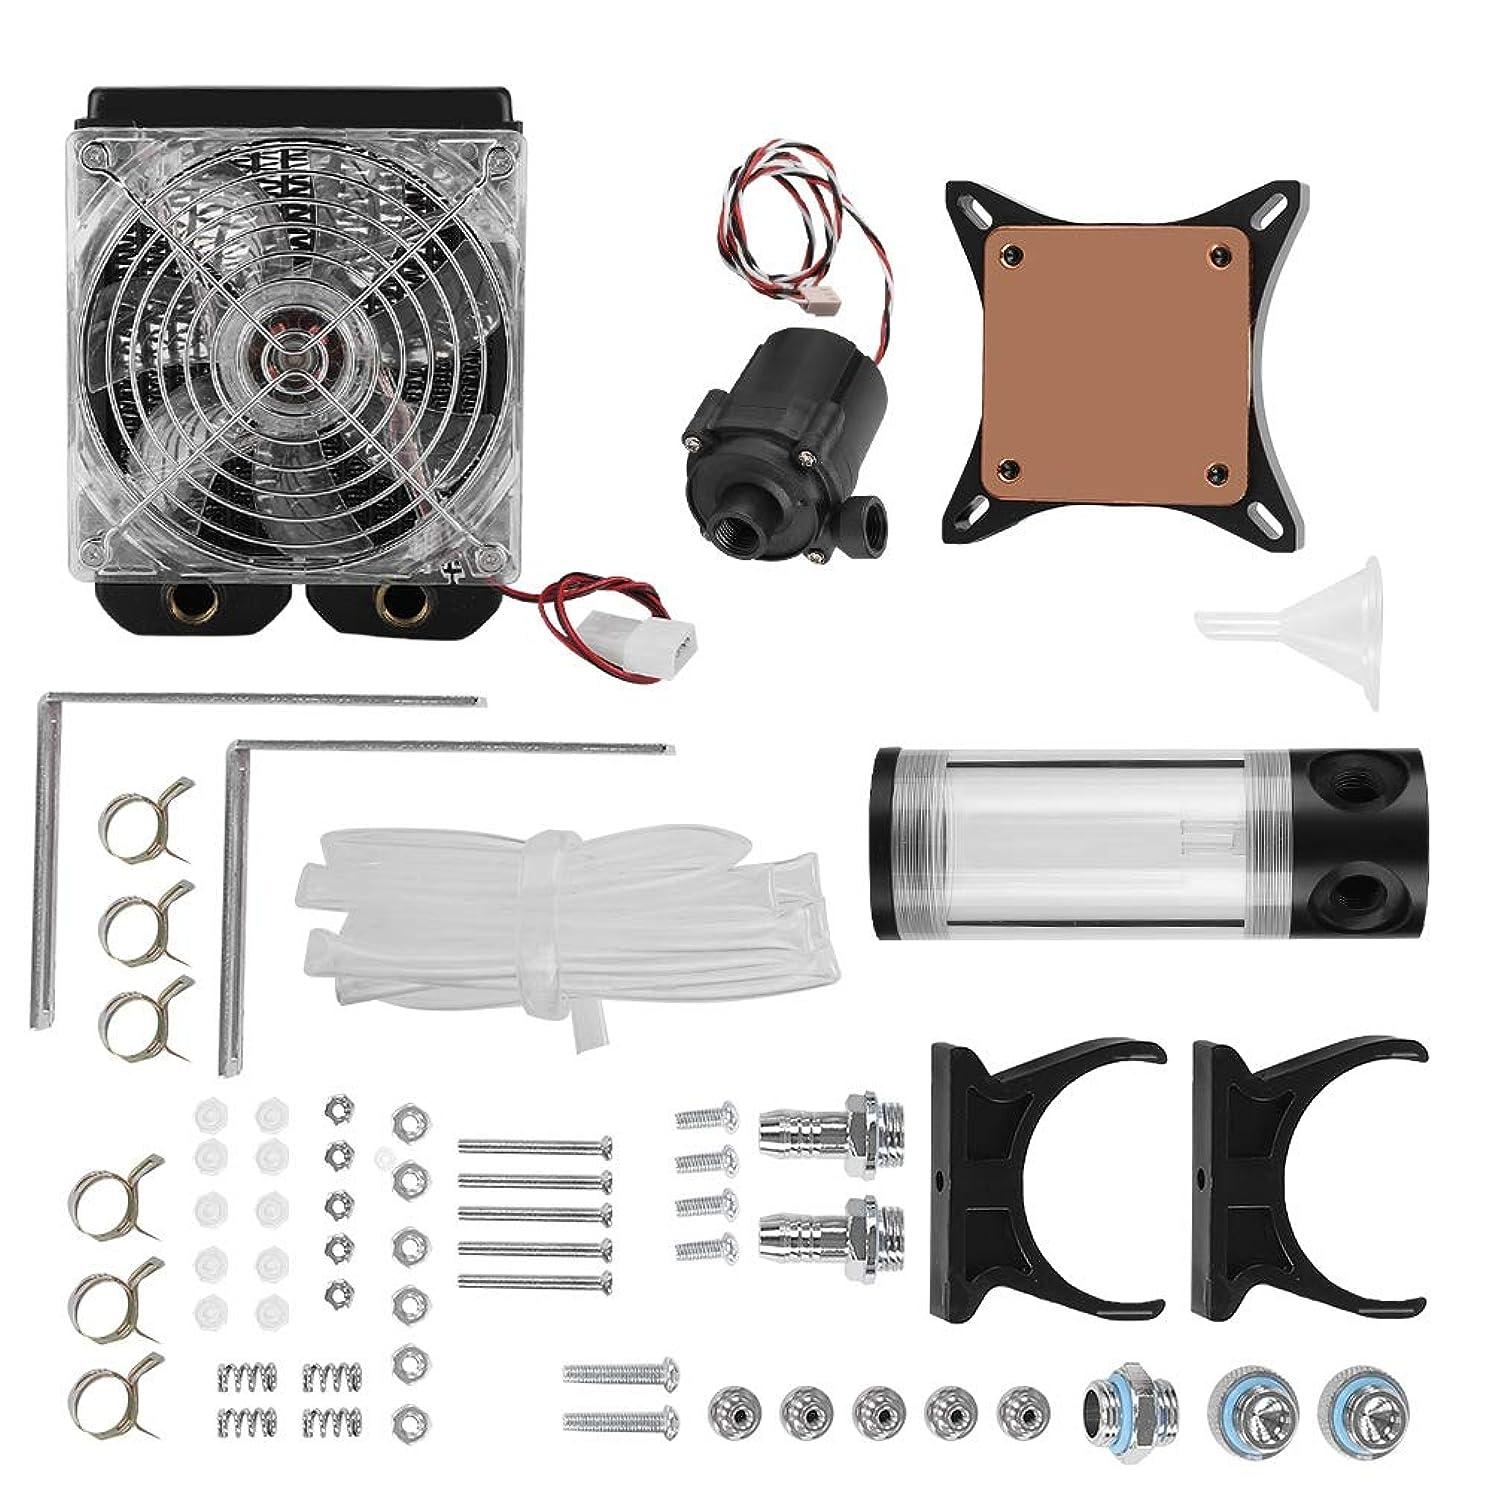 Pokerty Cooling Heatsink, DIY Computer Water Cooled Heat Dissipation Set Cooling Heatsink Radiator Pump Reservoir